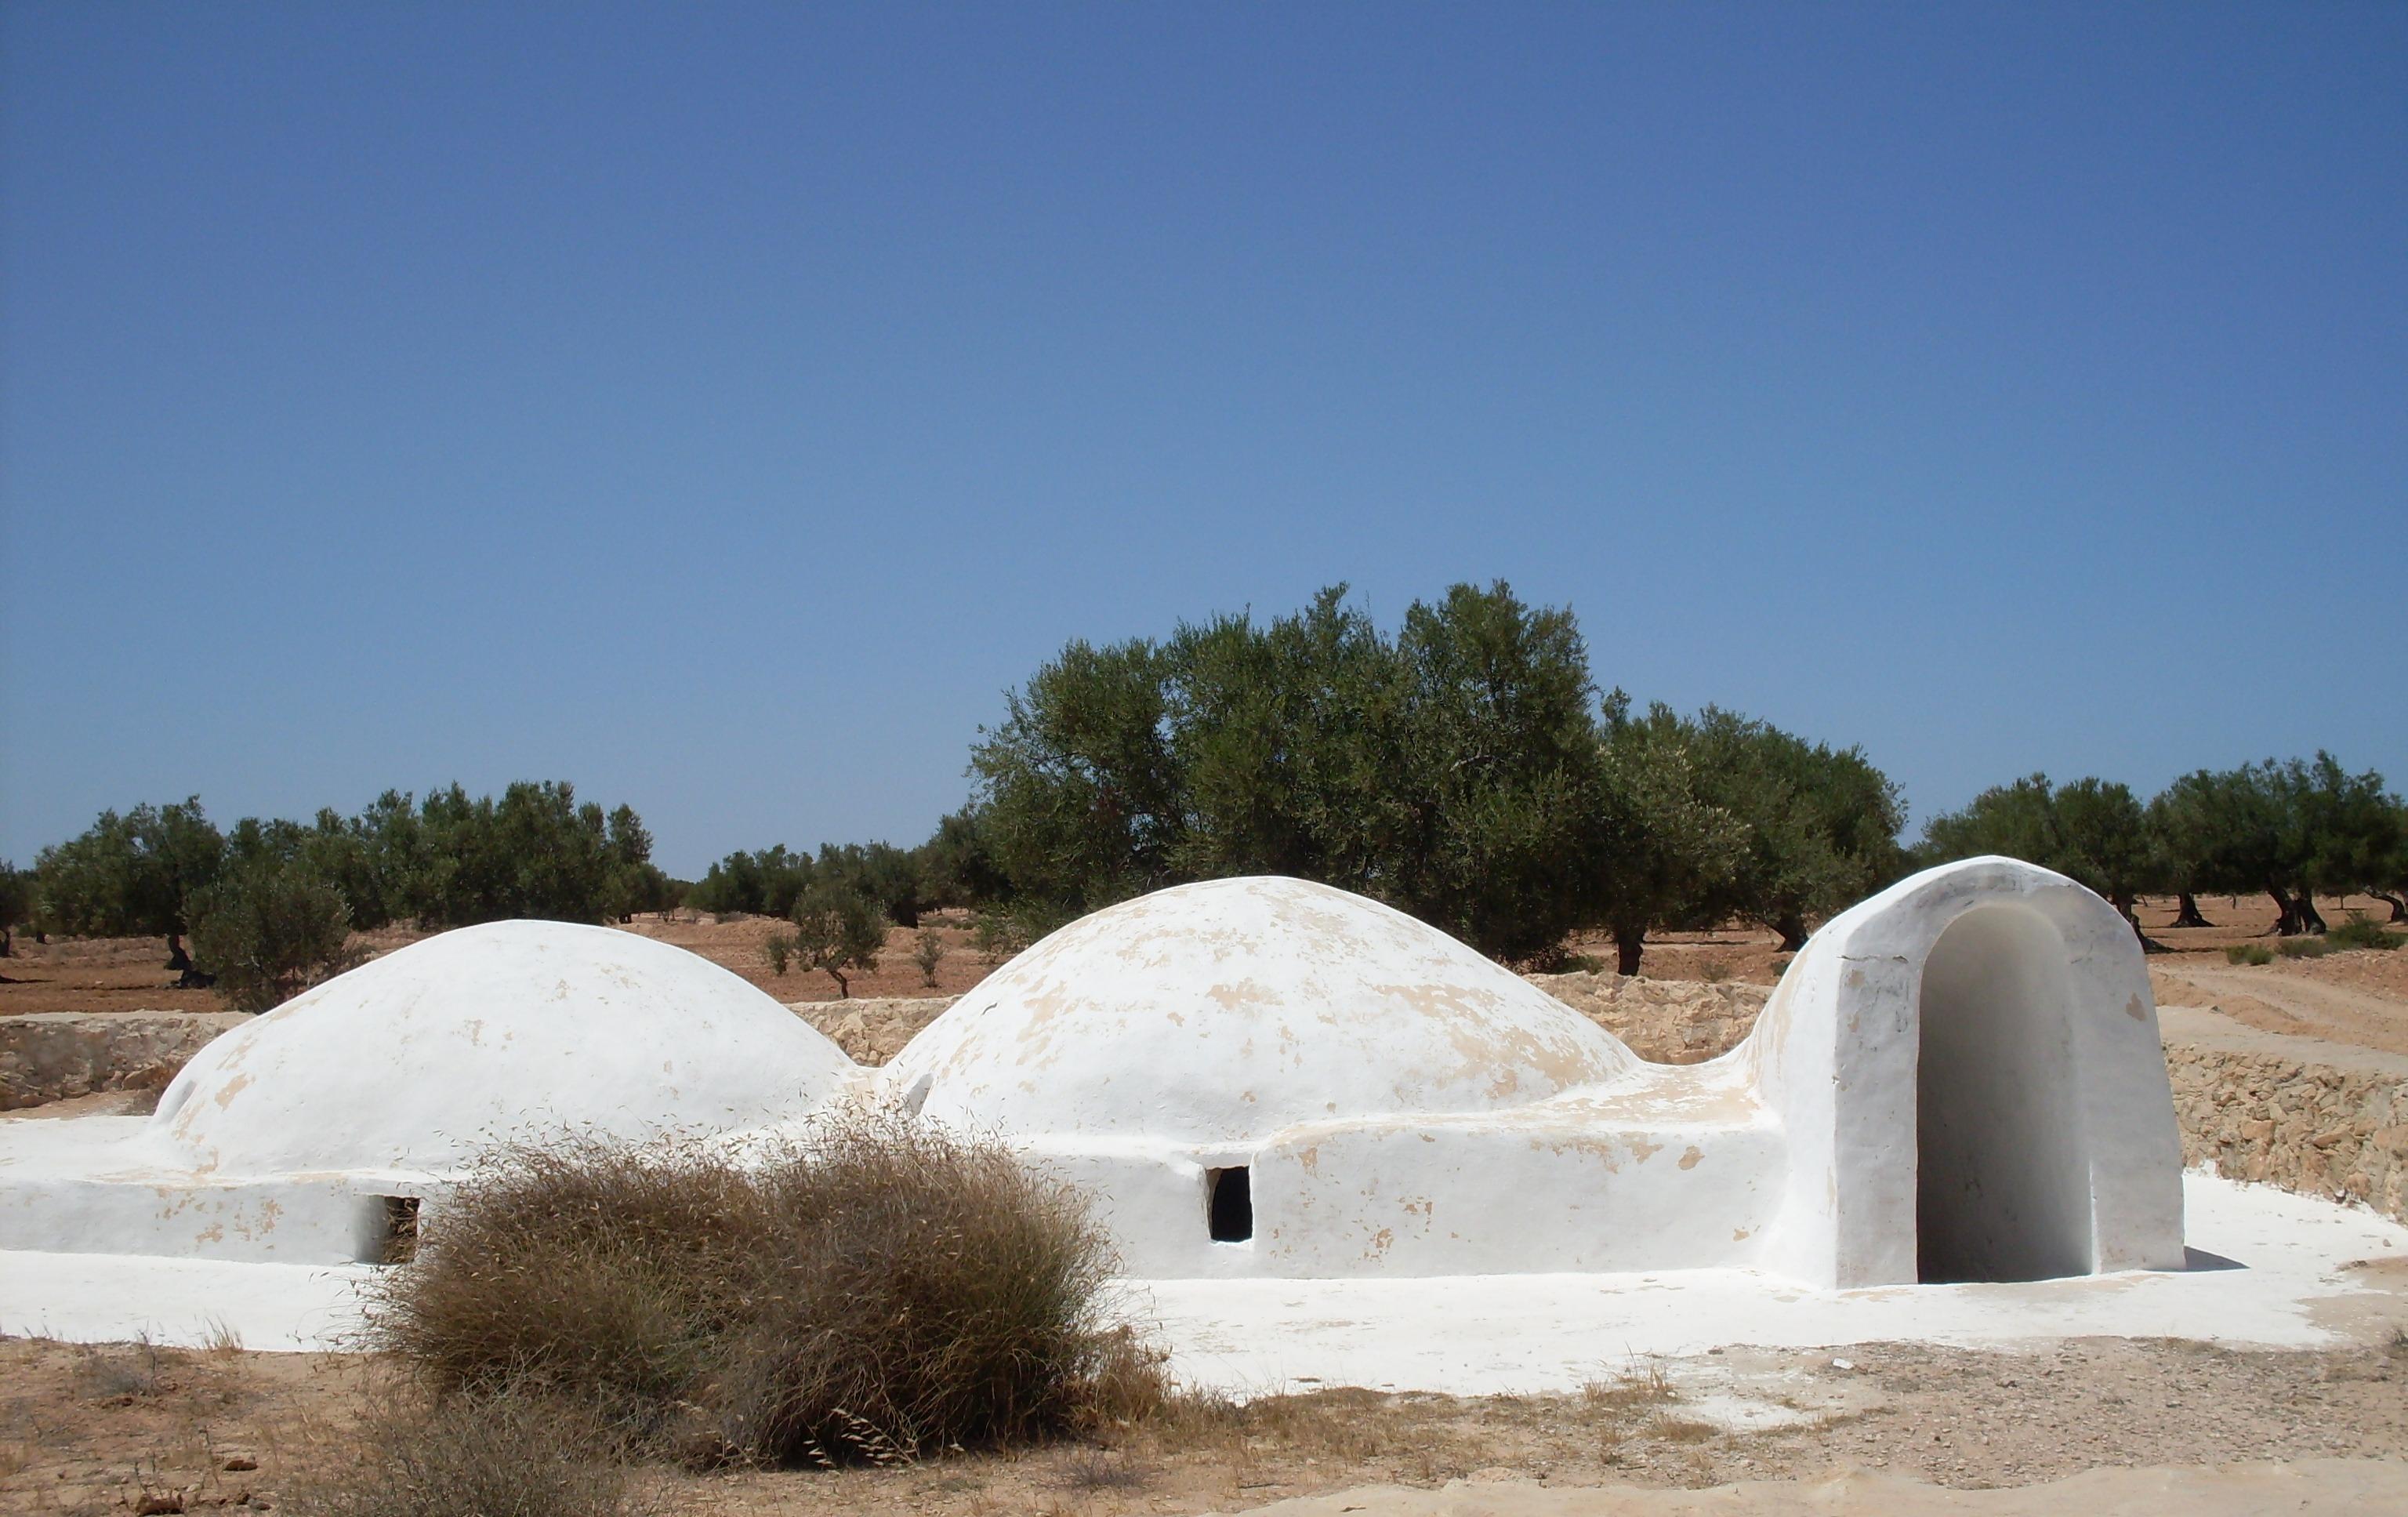 http://upload.wikimedia.org/wikipedia/commons/7/7d/Djerba_Mosqu%C3%A9e_sous_terraine.jpg